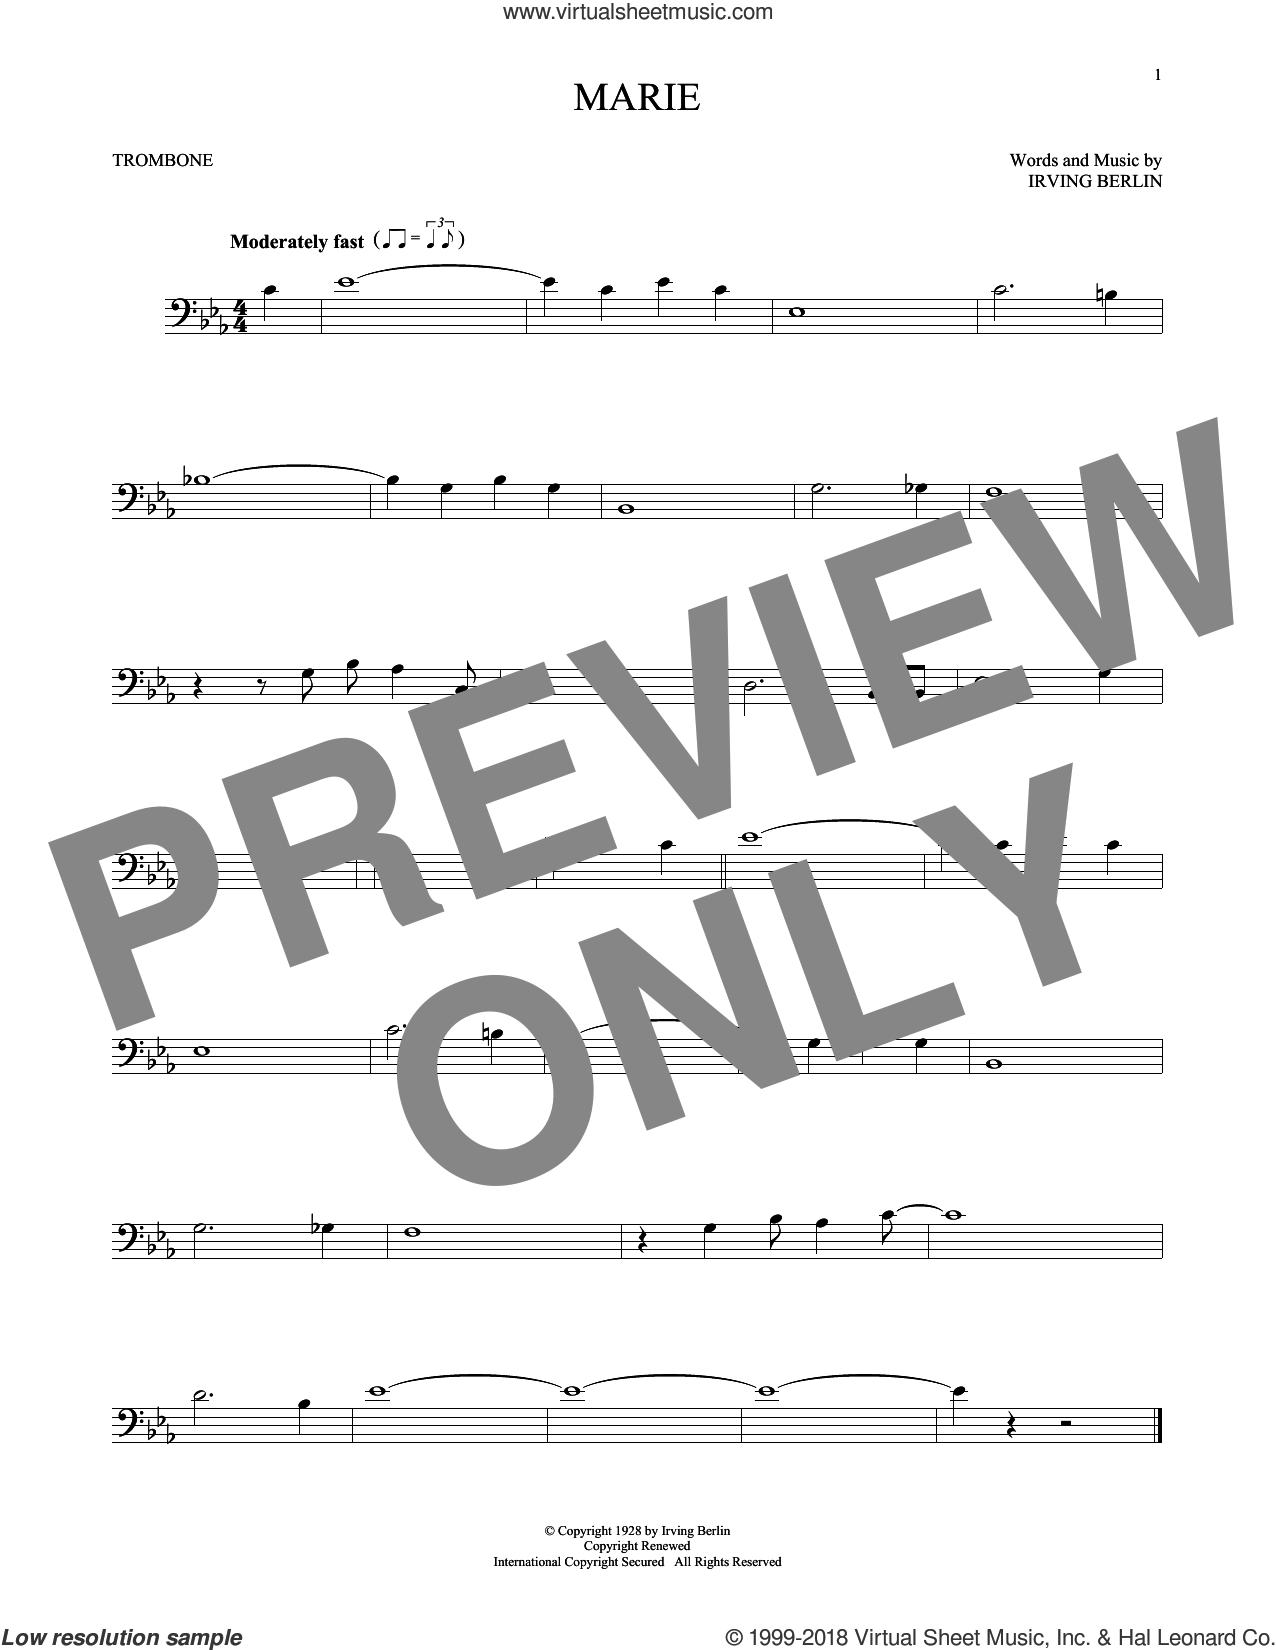 Marie sheet music for trombone solo by Irving Berlin, intermediate skill level